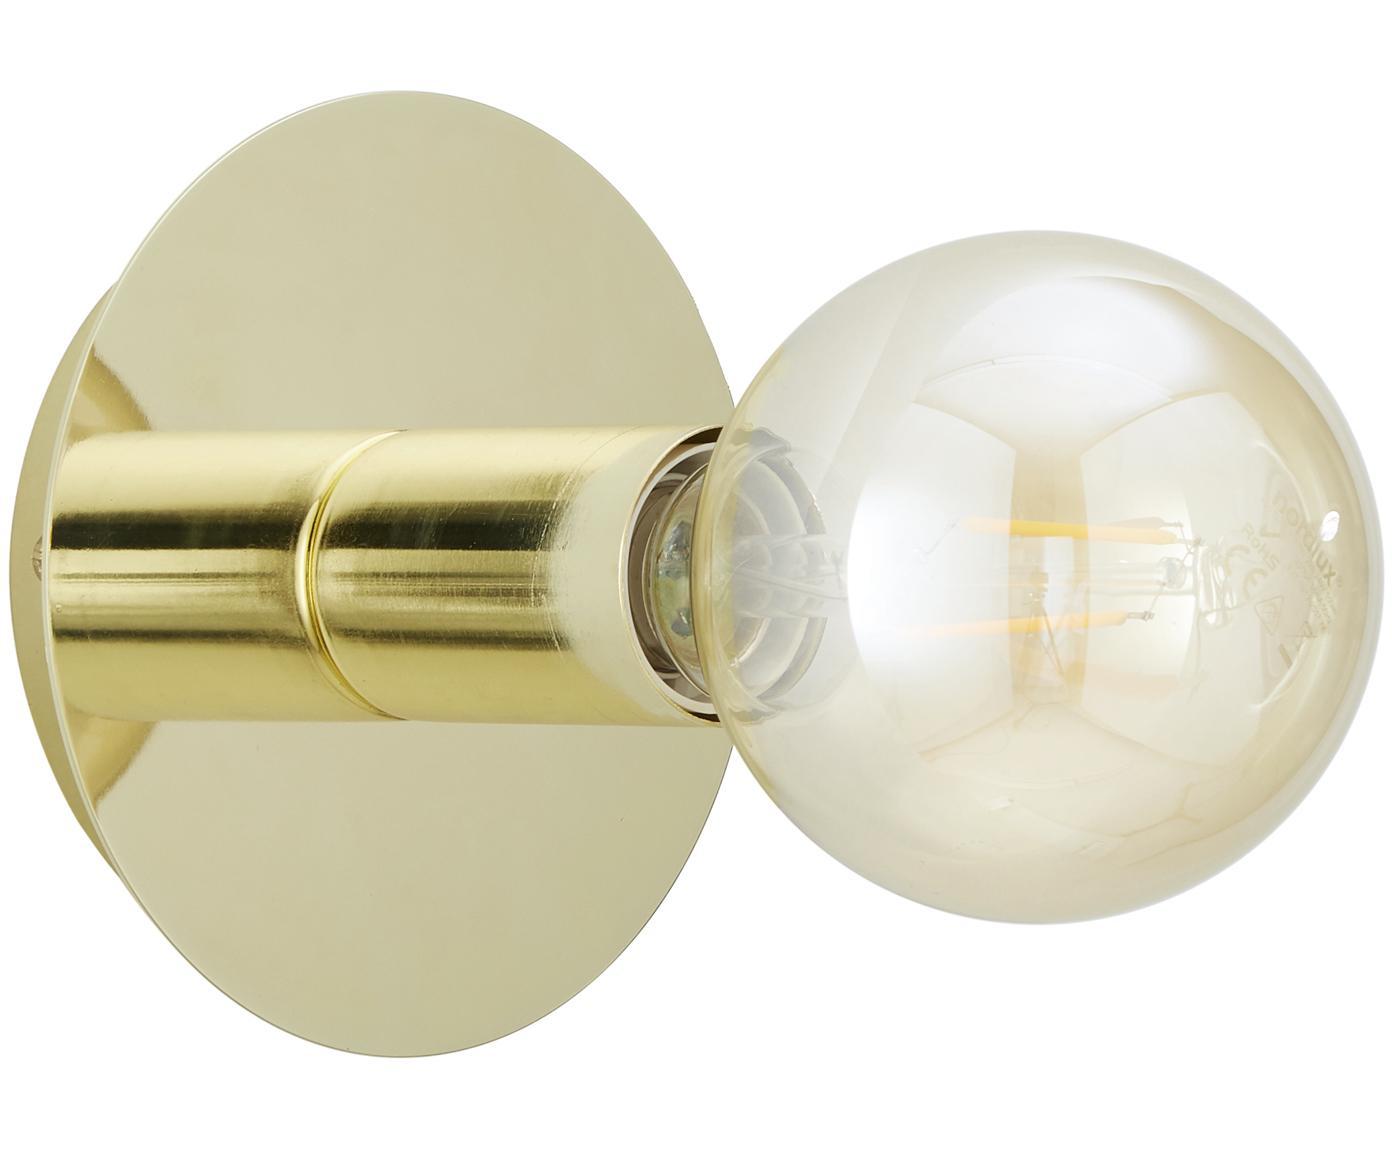 Wandlamp Percy, Vermessingd metaal, Glanzend messing, Ø 14 cm